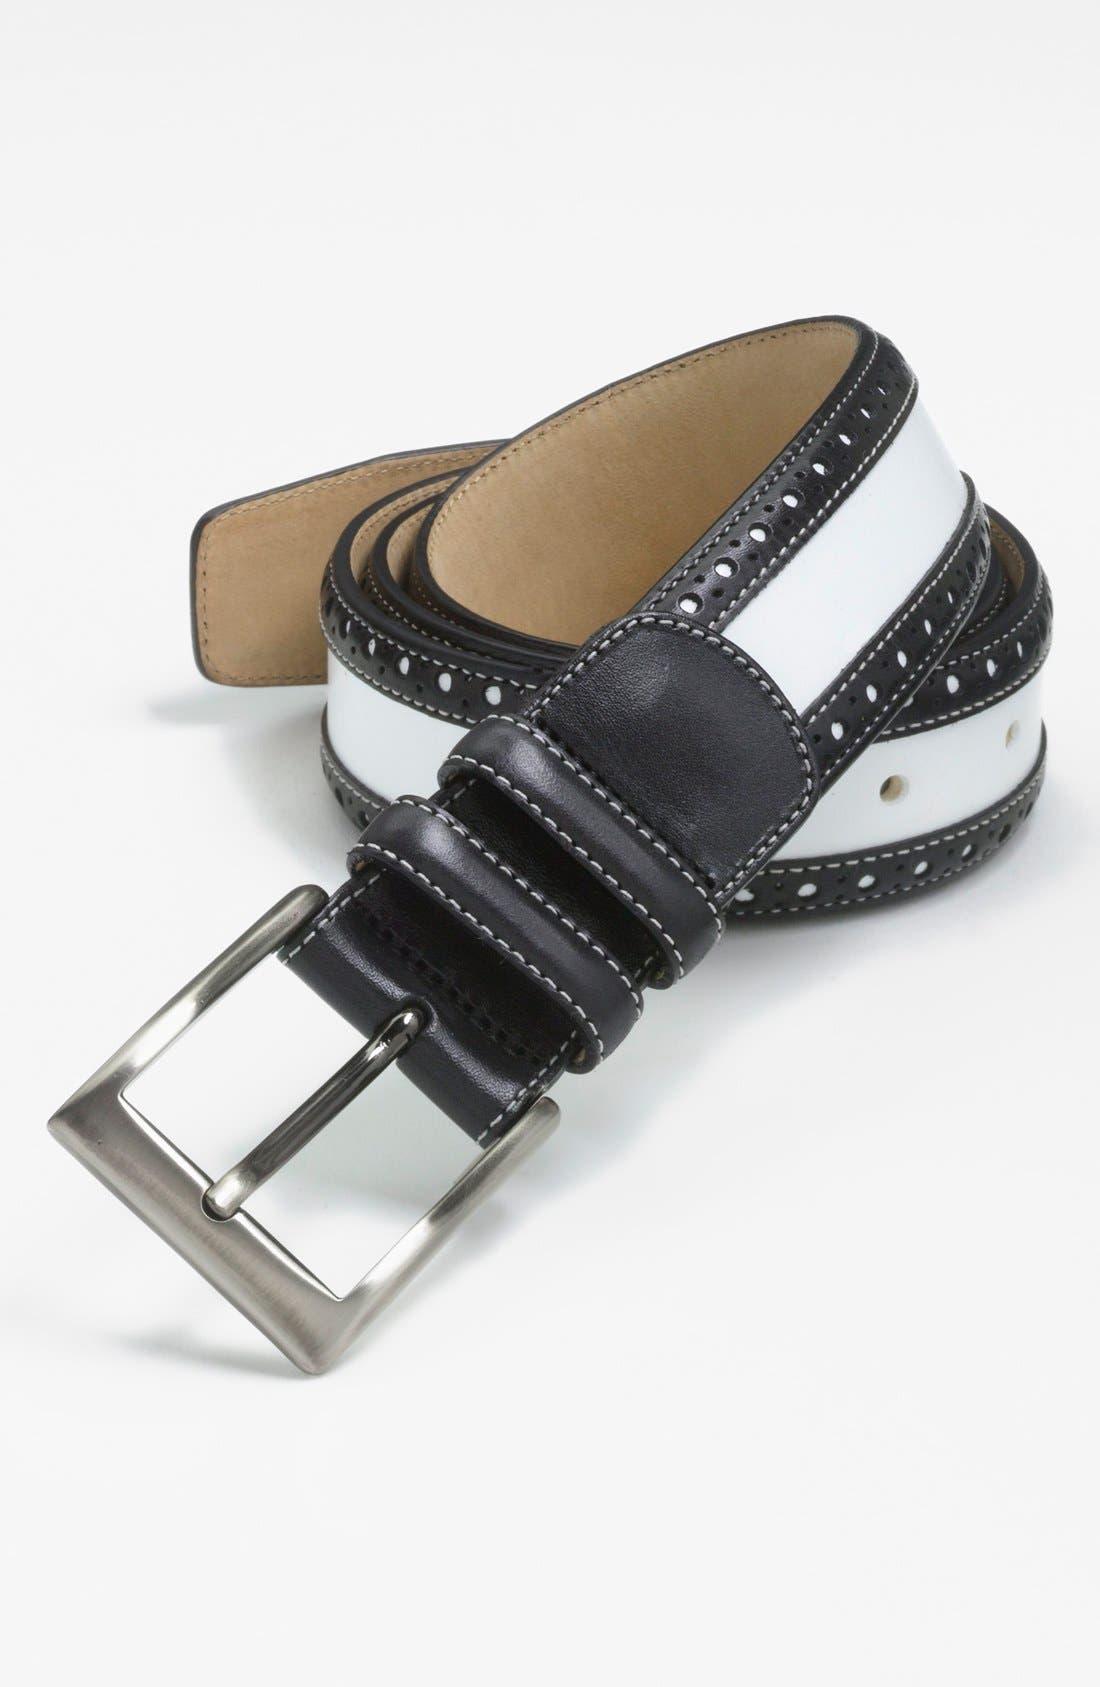 Main Image - Mezlan 'Parma Diver' Belt